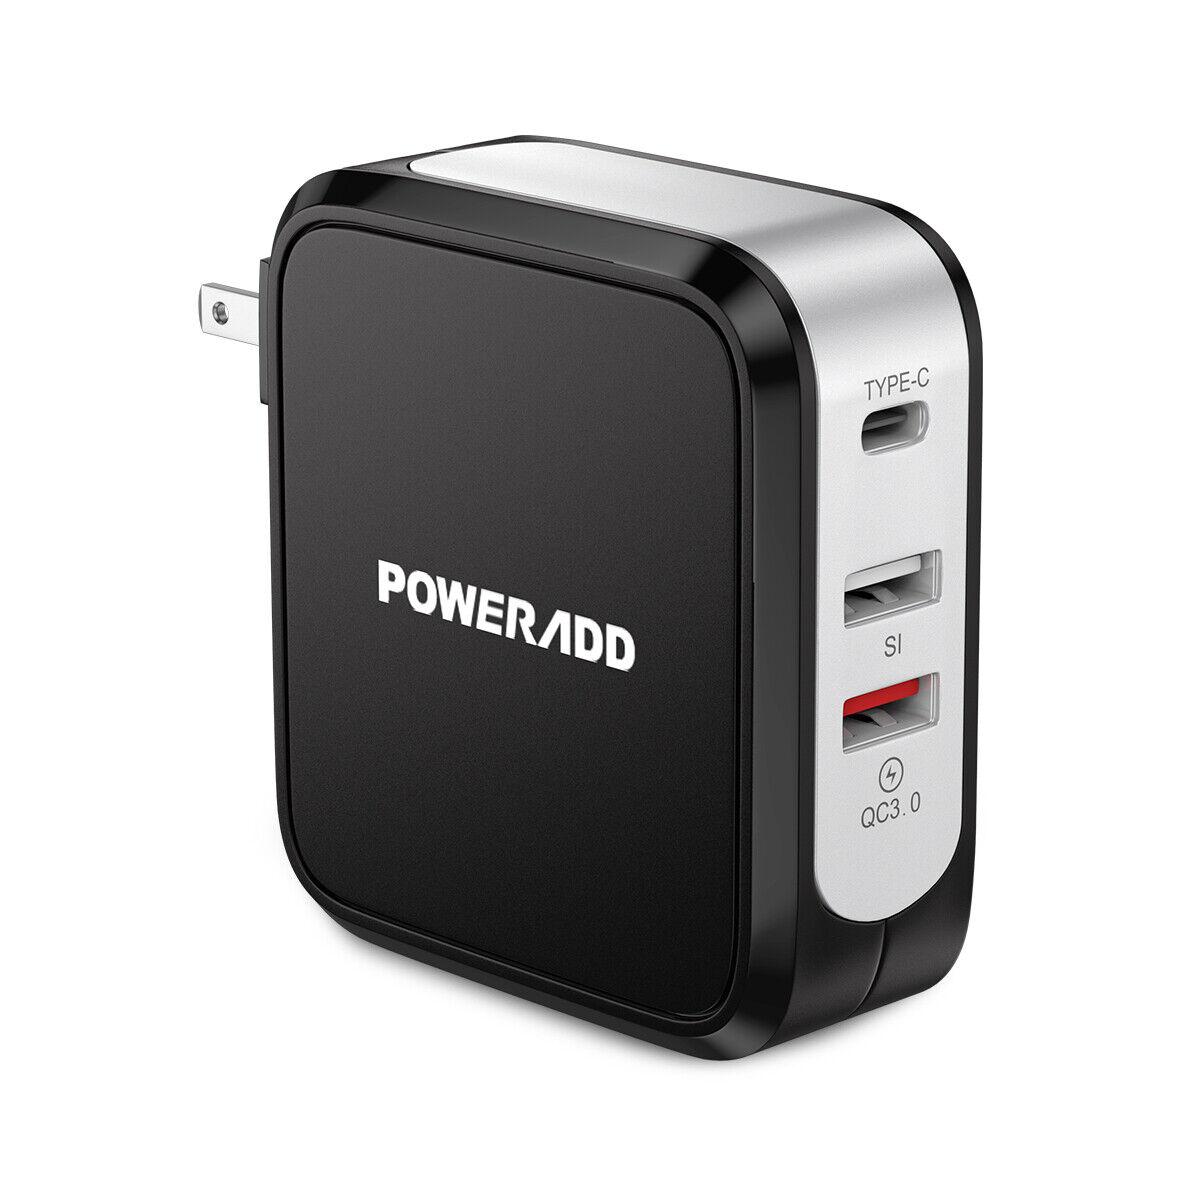 4 USB Multi Port Hub 5V 2.4A Portable Home Wall Charger Powe